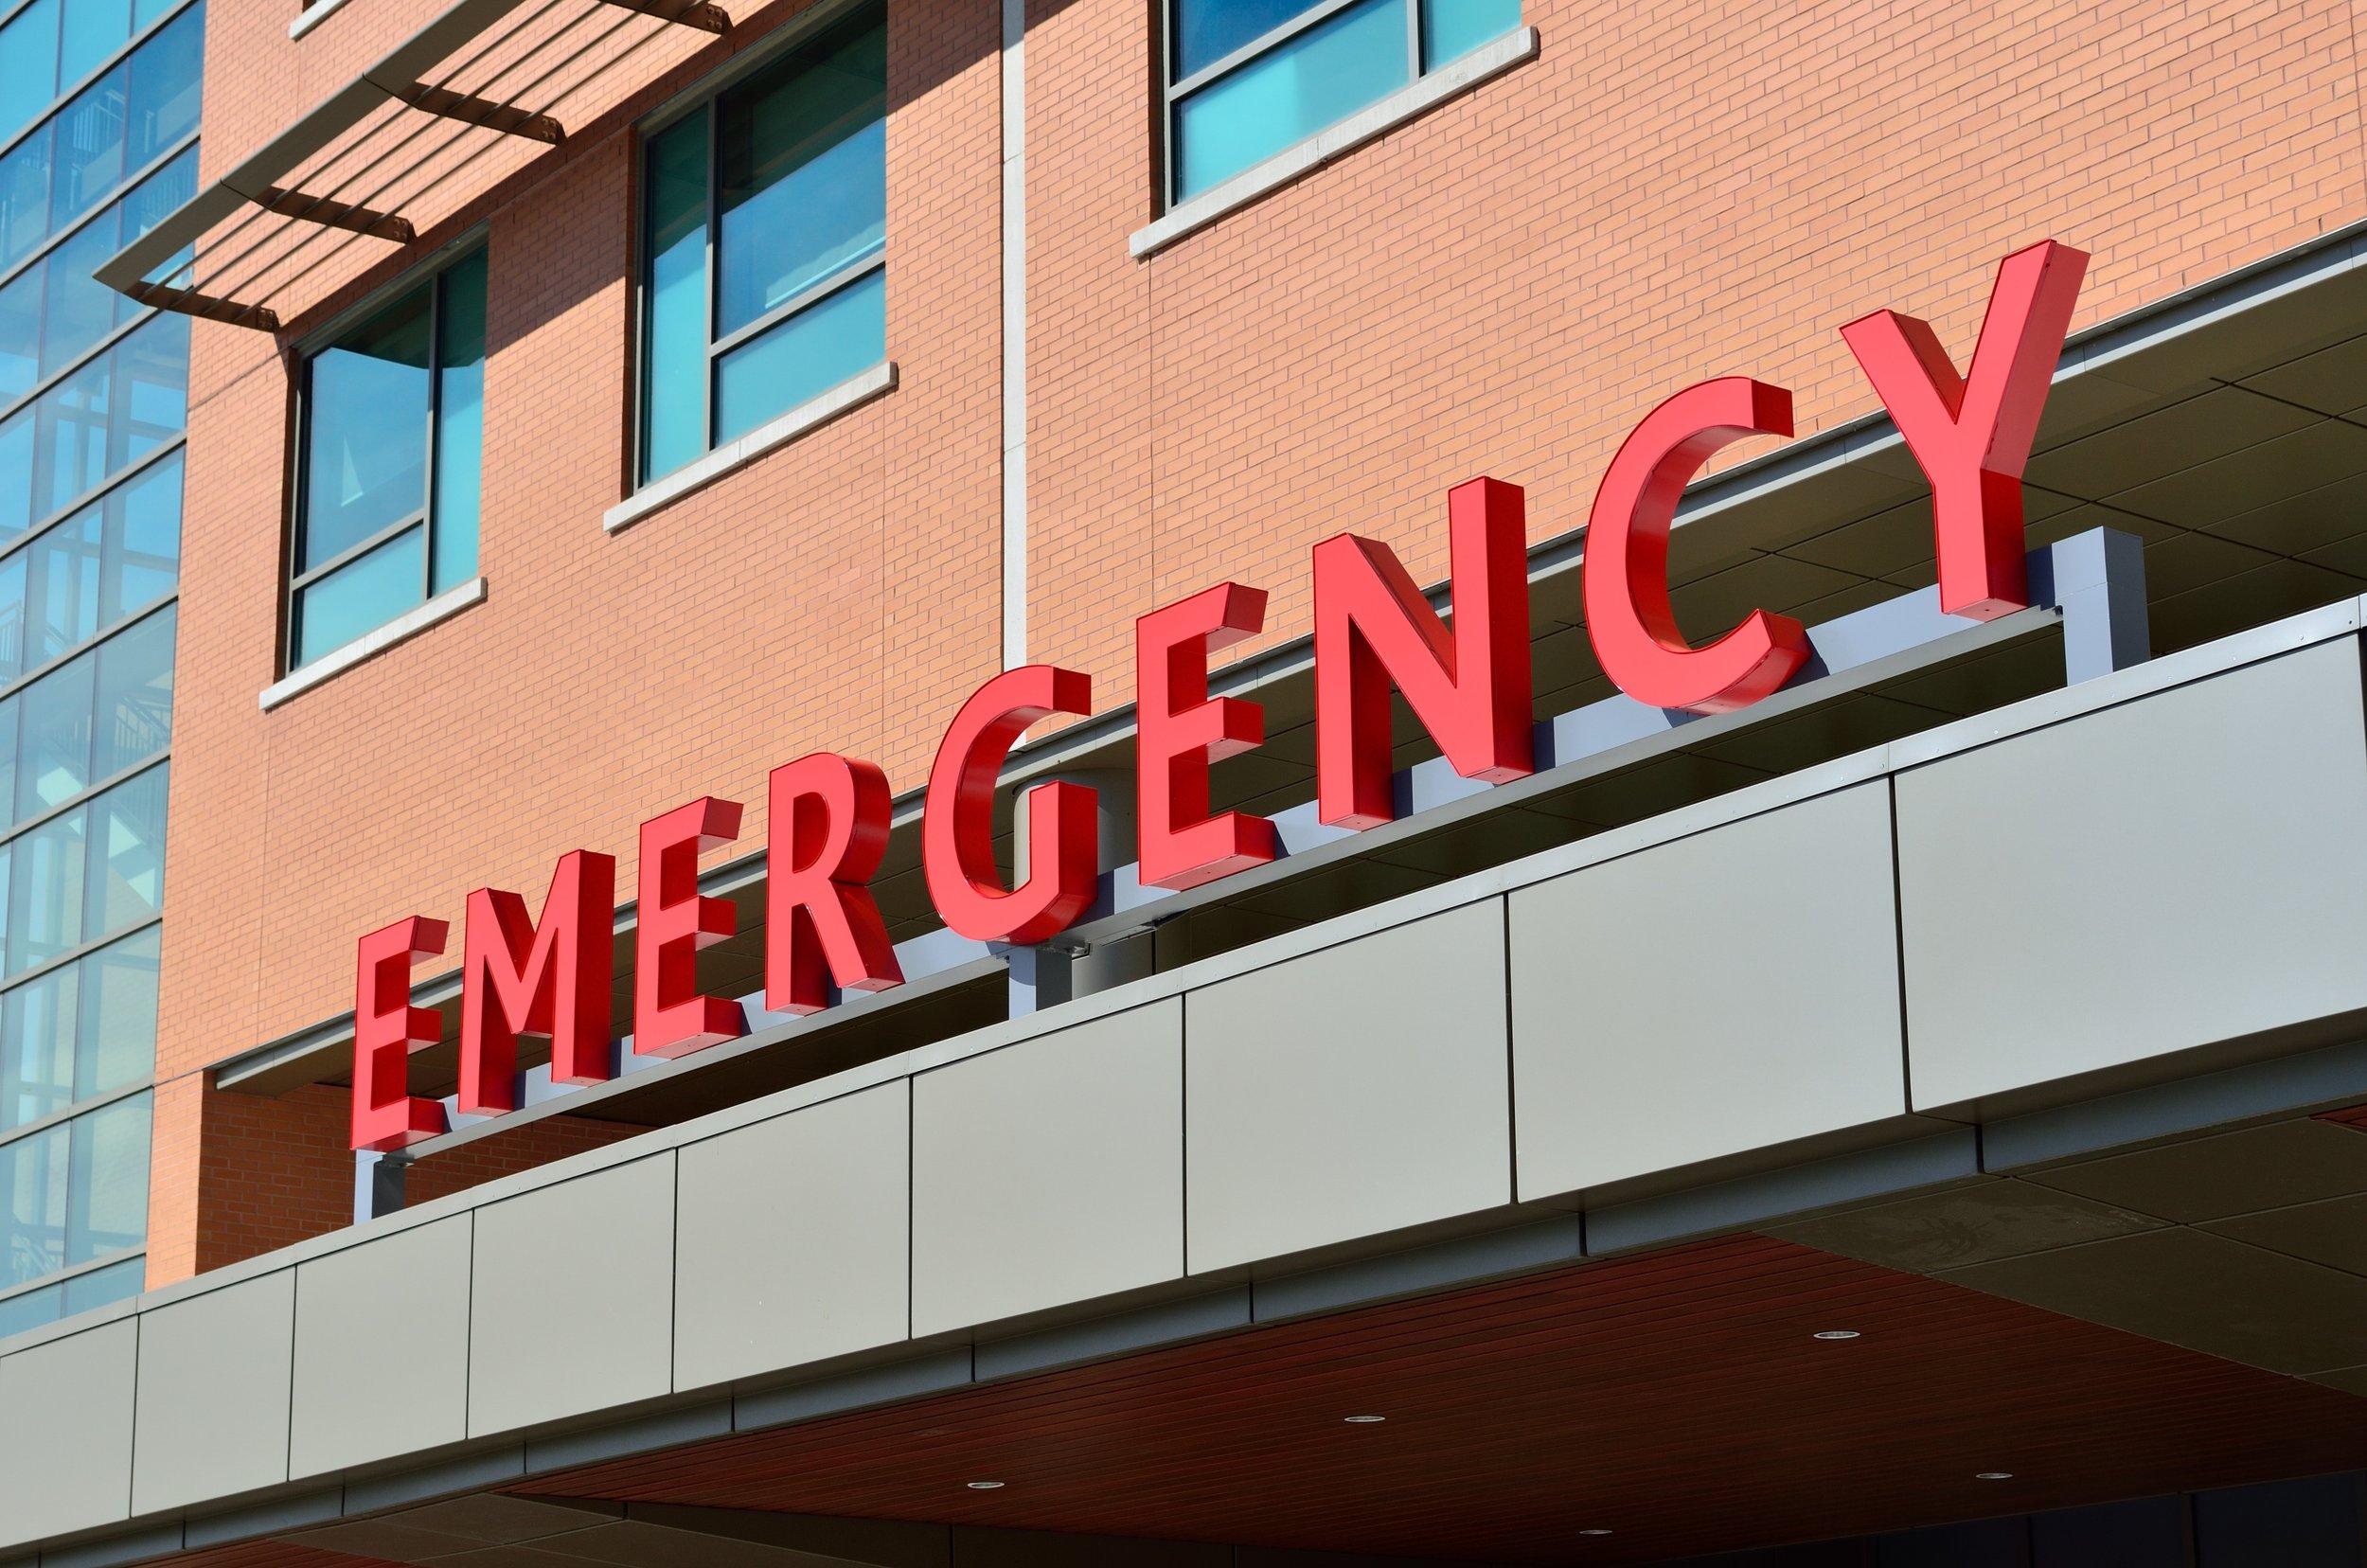 ambulance-architecture-building-263402.jpg